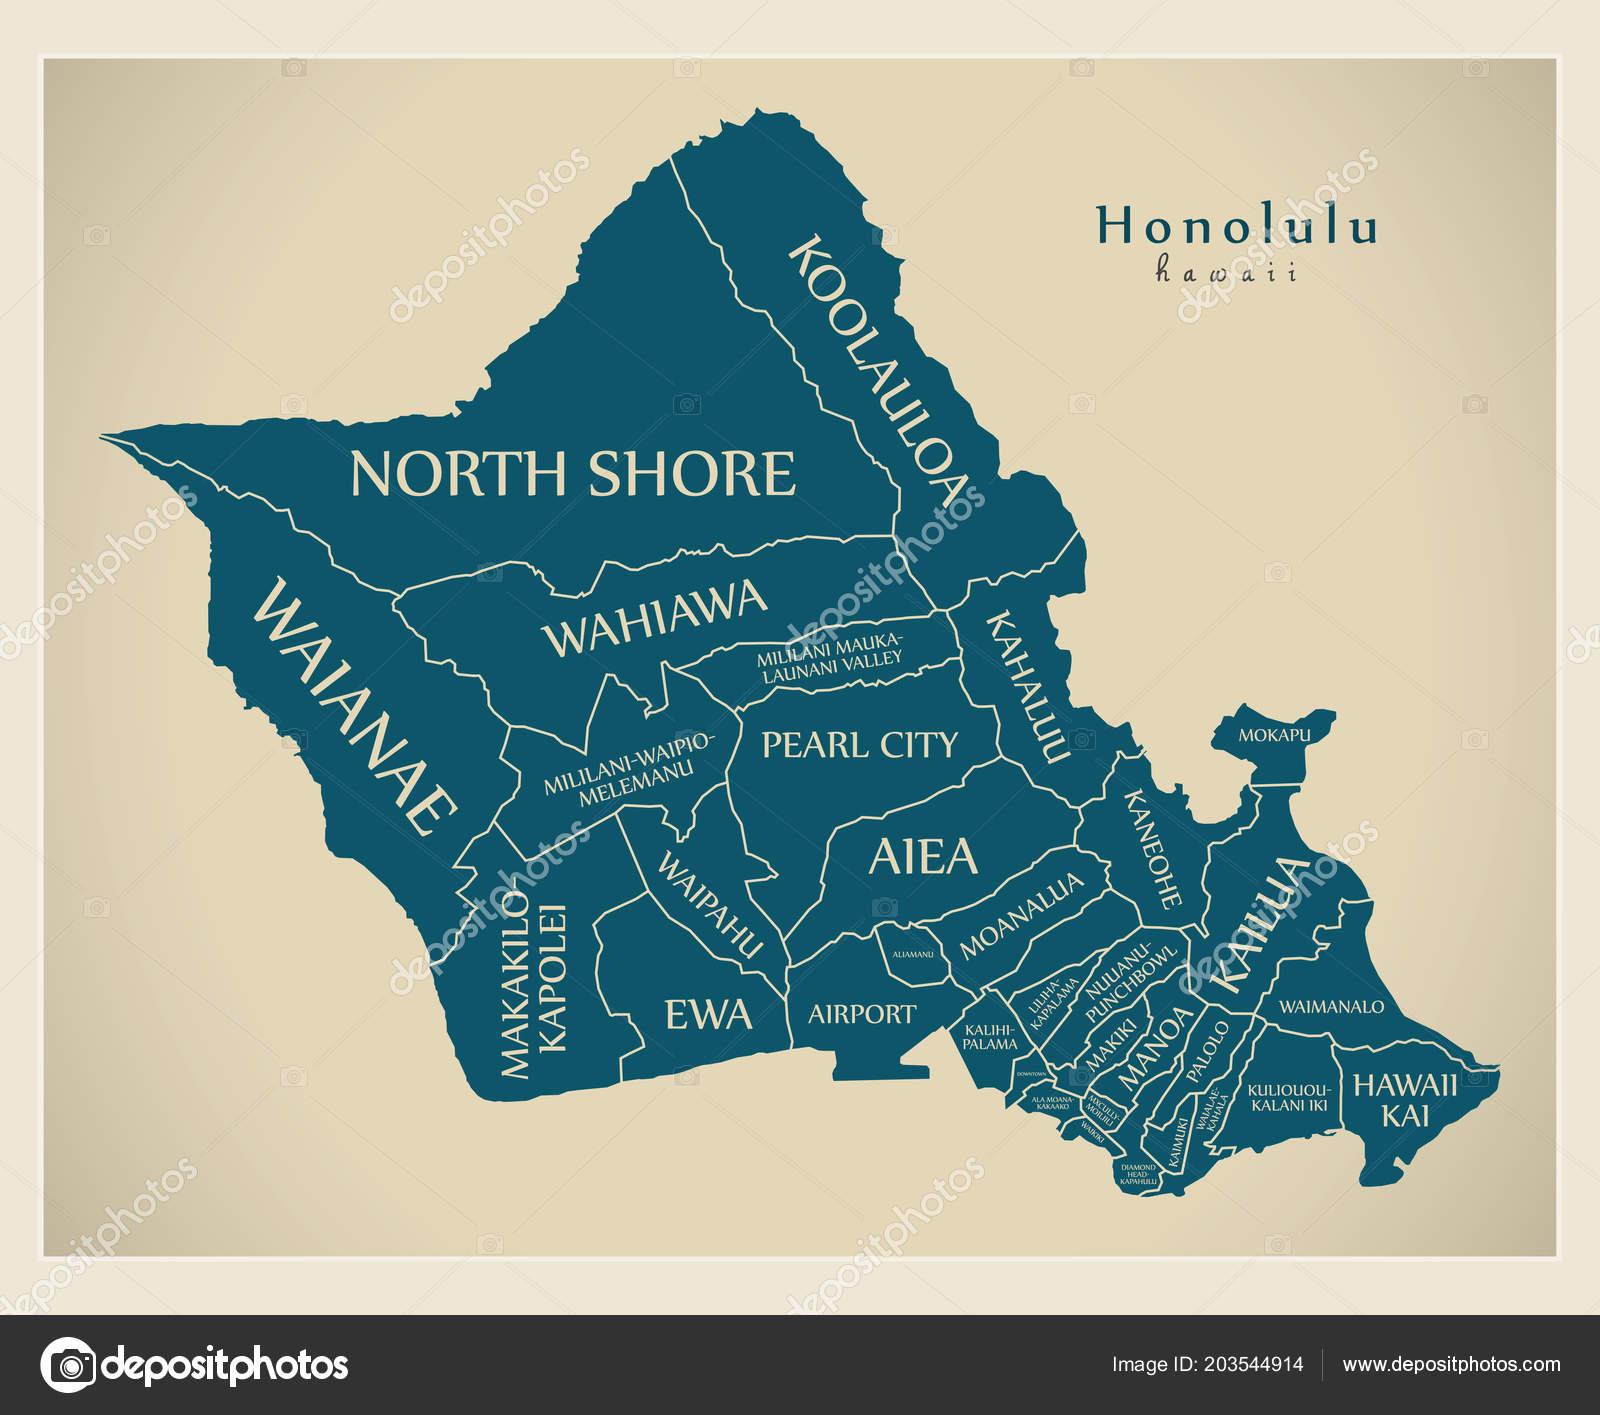 Moderne City Map Honolulu Hawaii Stadt Der Usa Mit Nachbarschaften ...